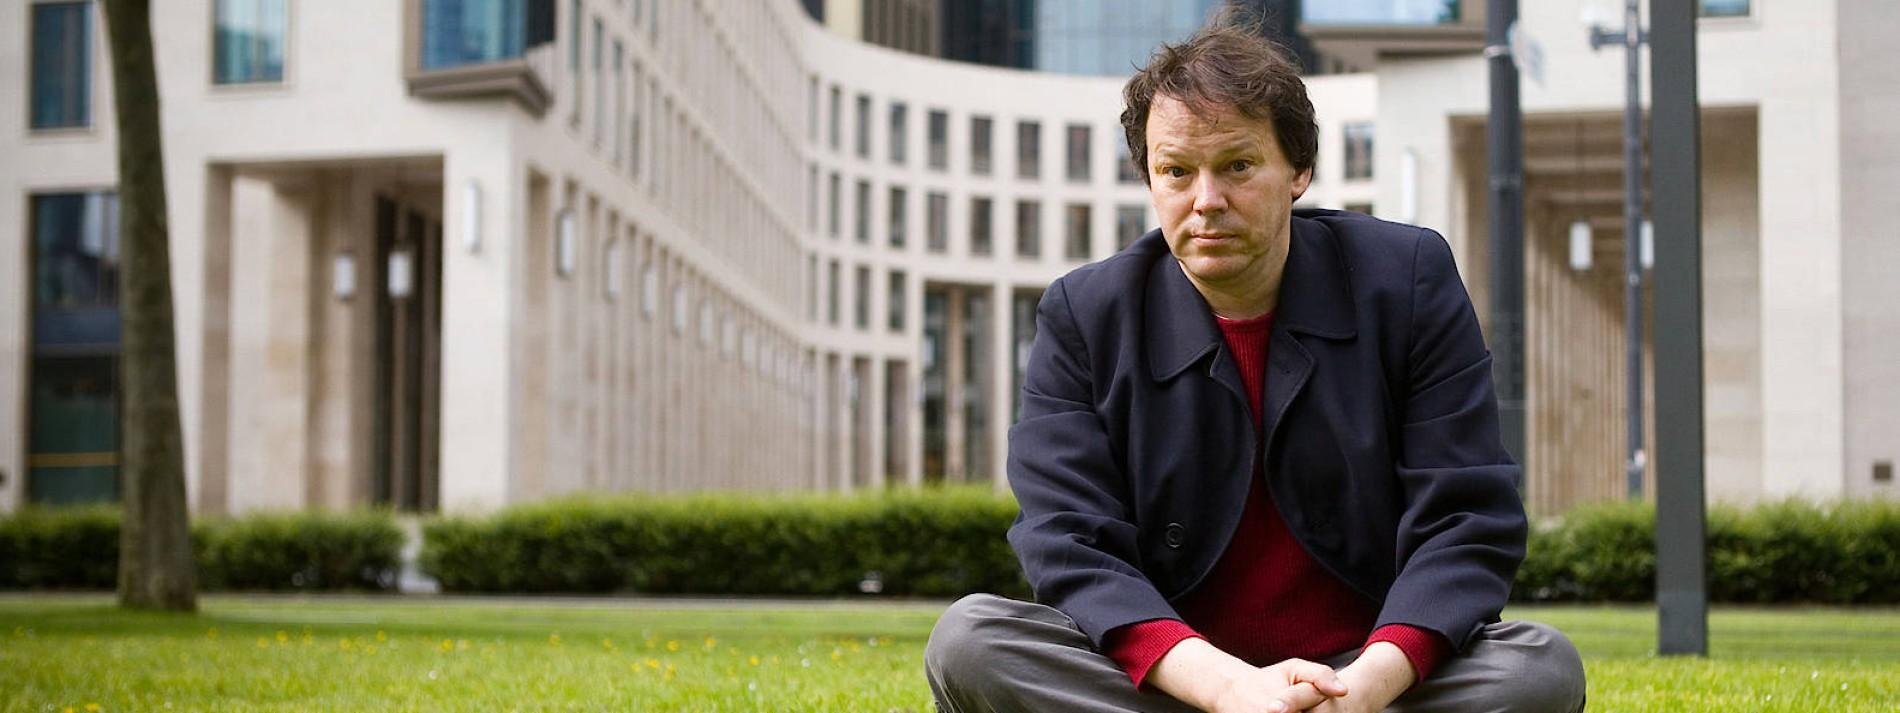 David Graeber gestorben